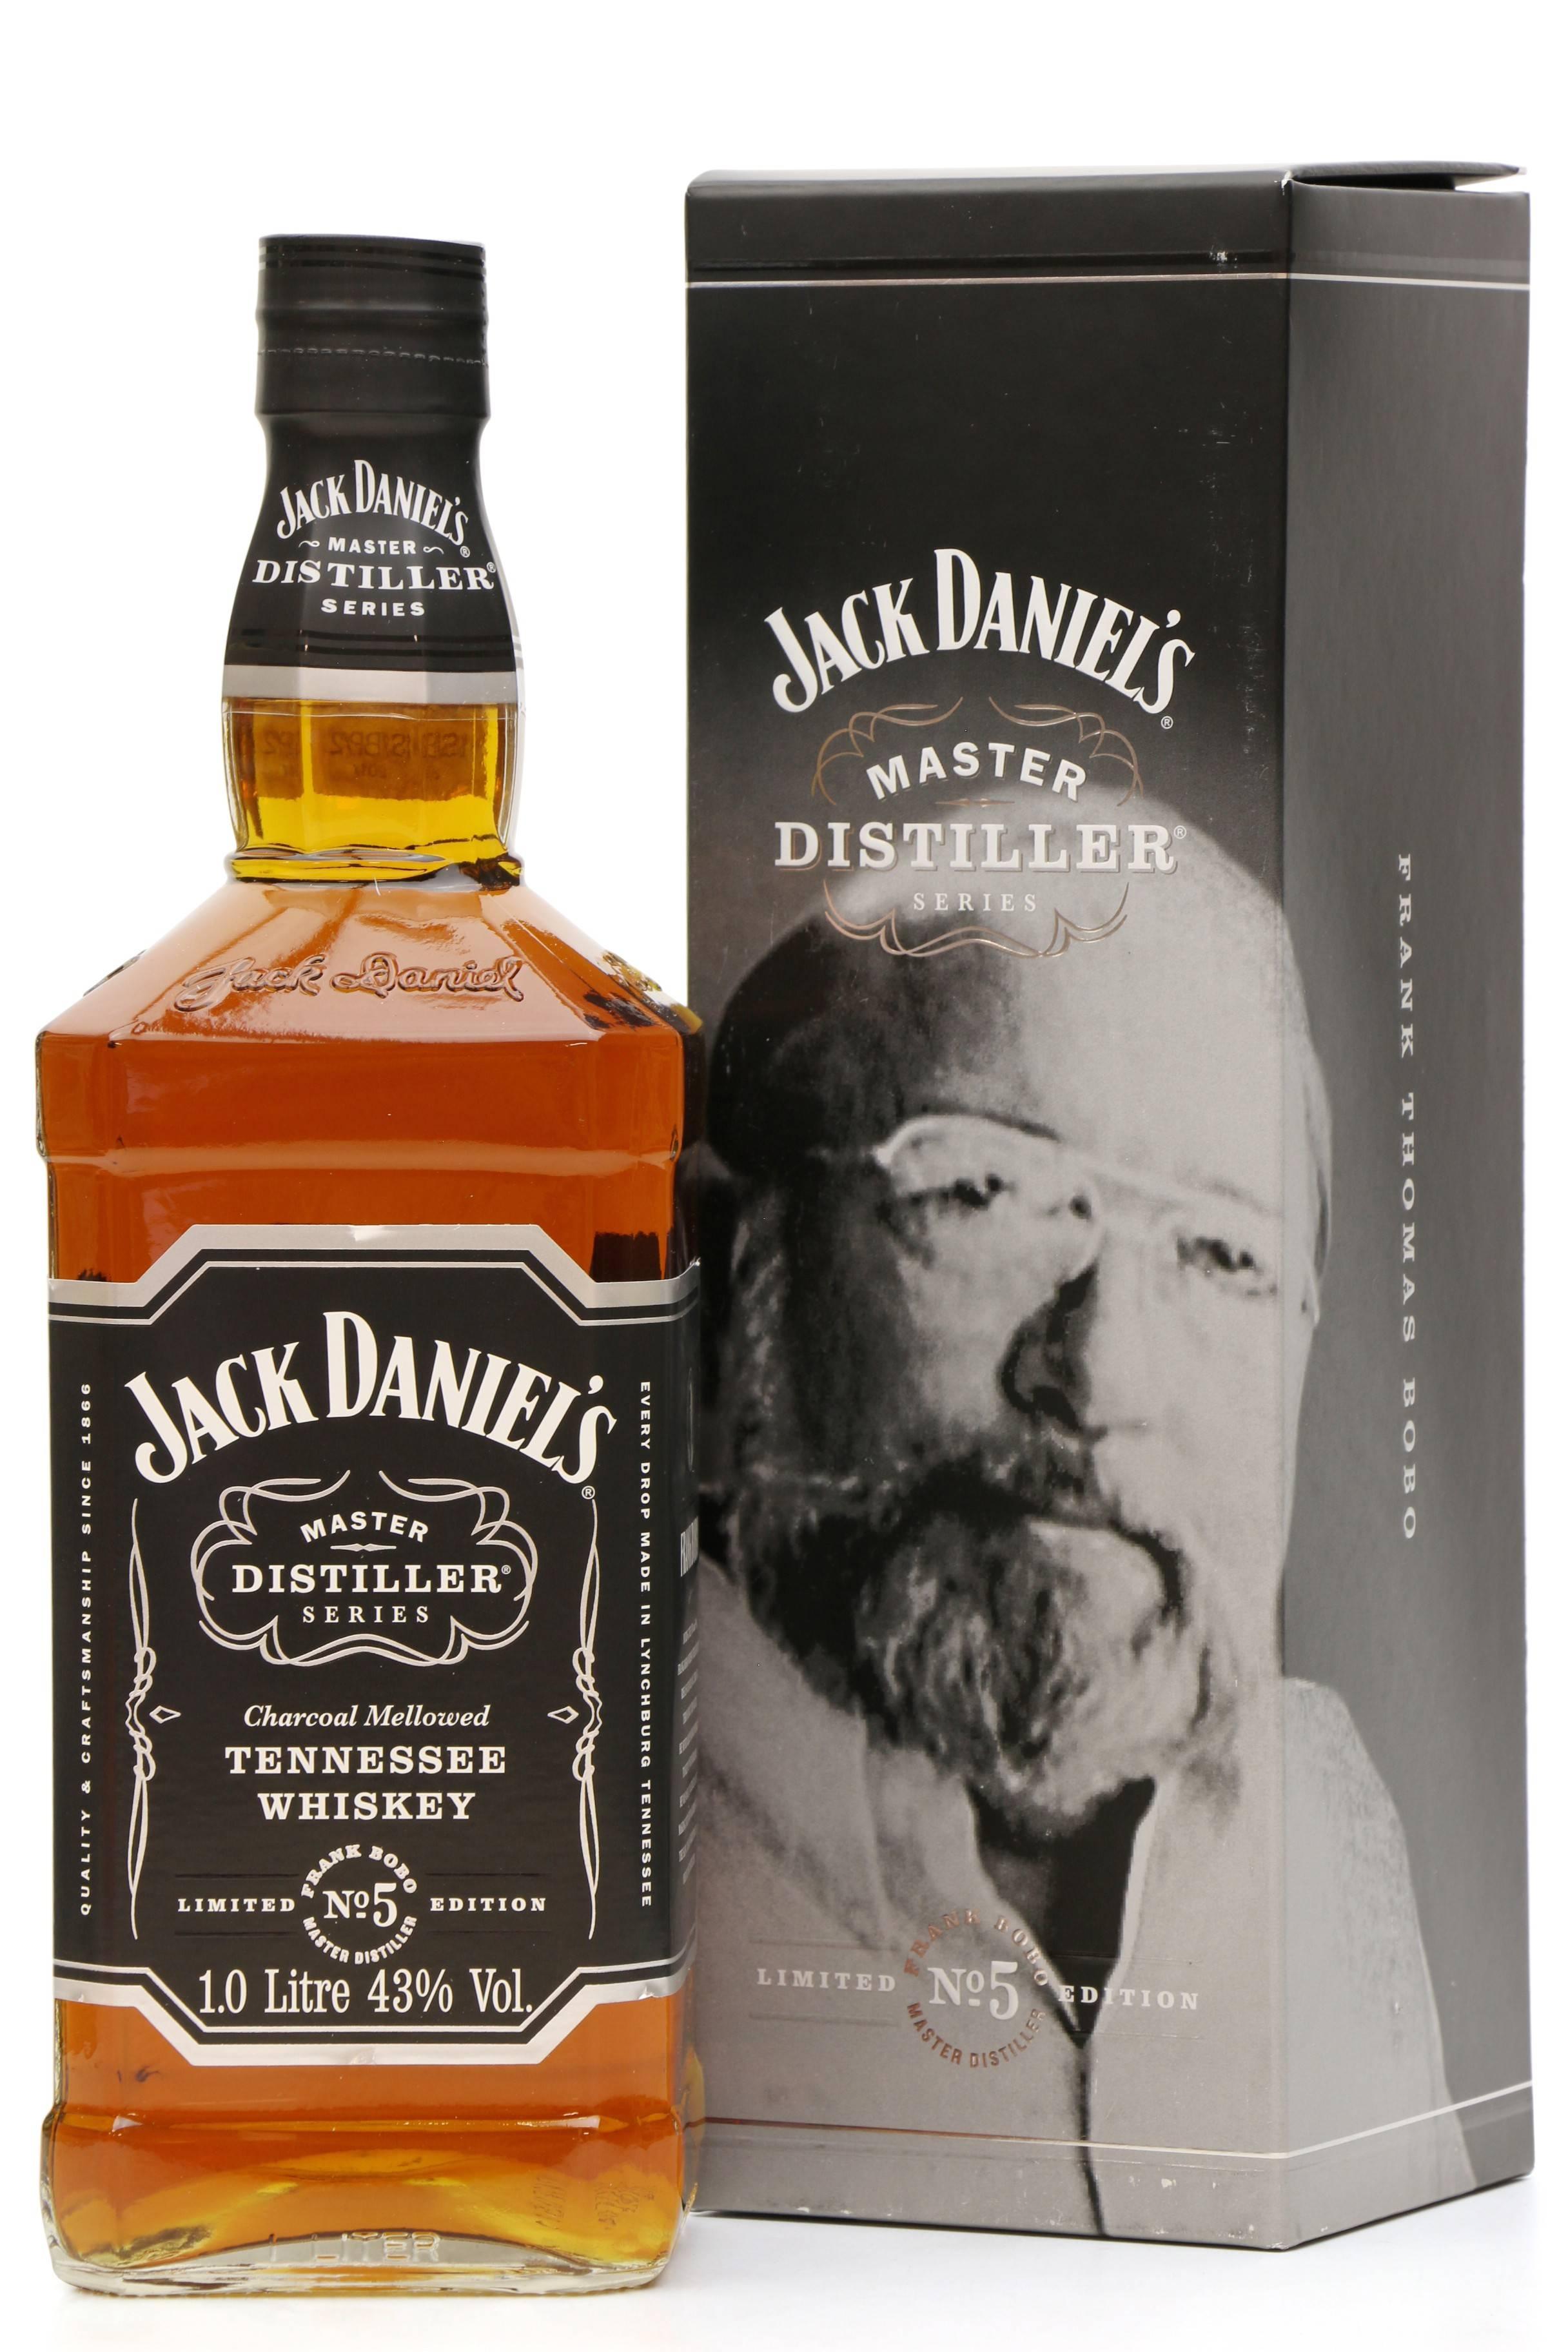 Jack Daniels master distiller no.5 £15.40 at Tesco Ballymena